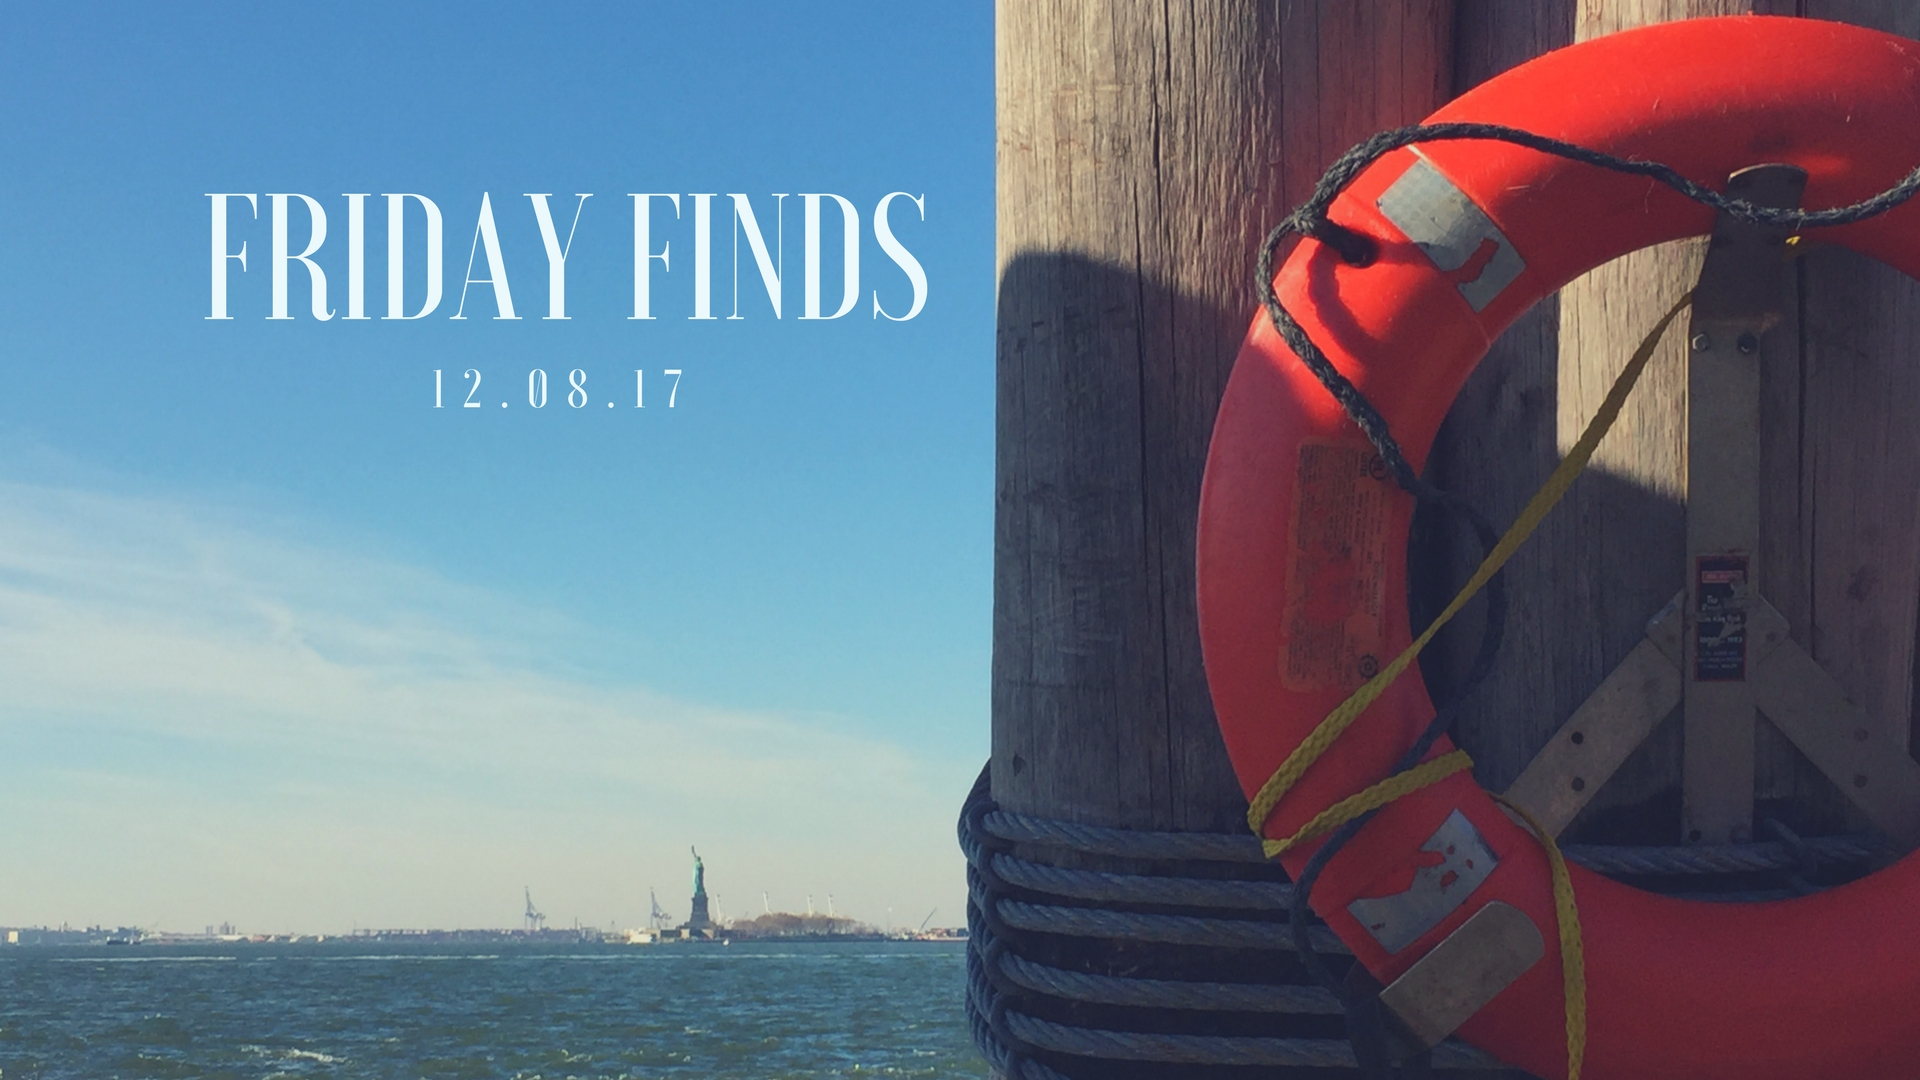 Friday Finds (1).jpg